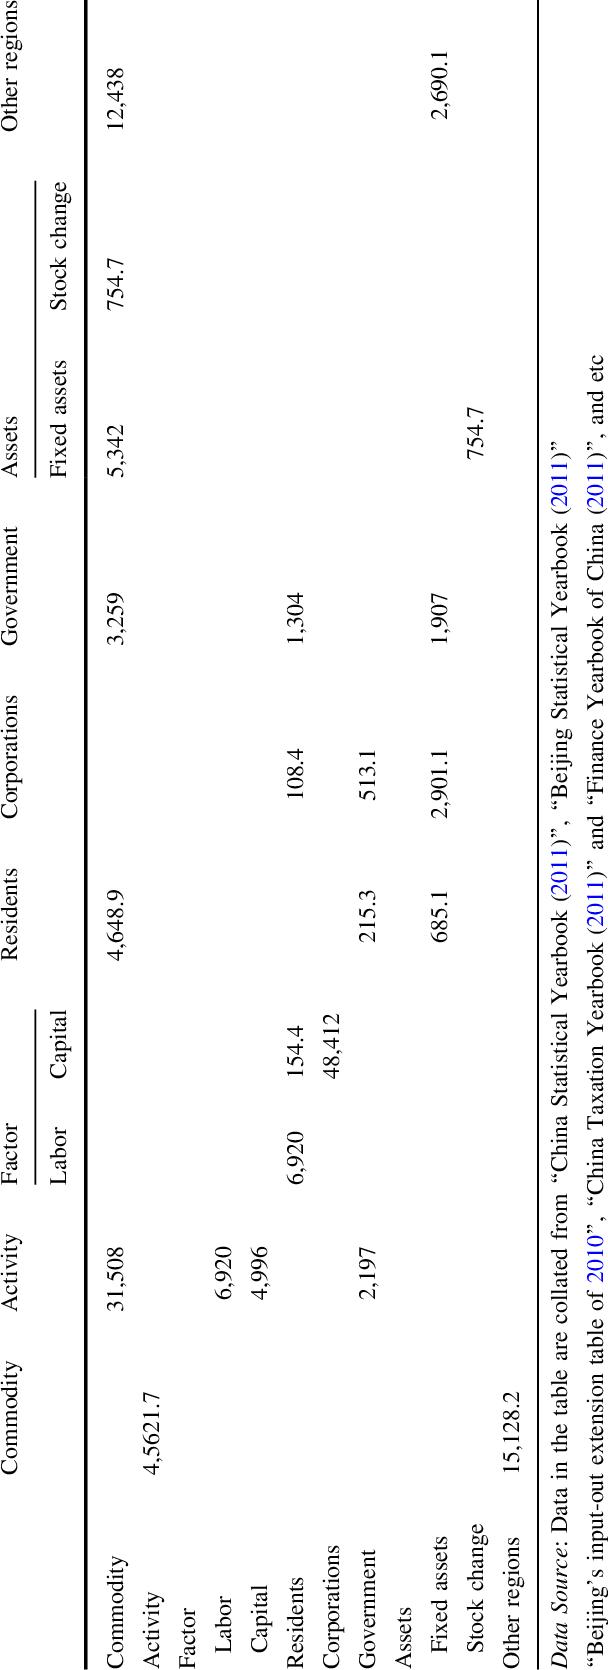 Beijing social accounting matrix of 2010 (Unit:hundred